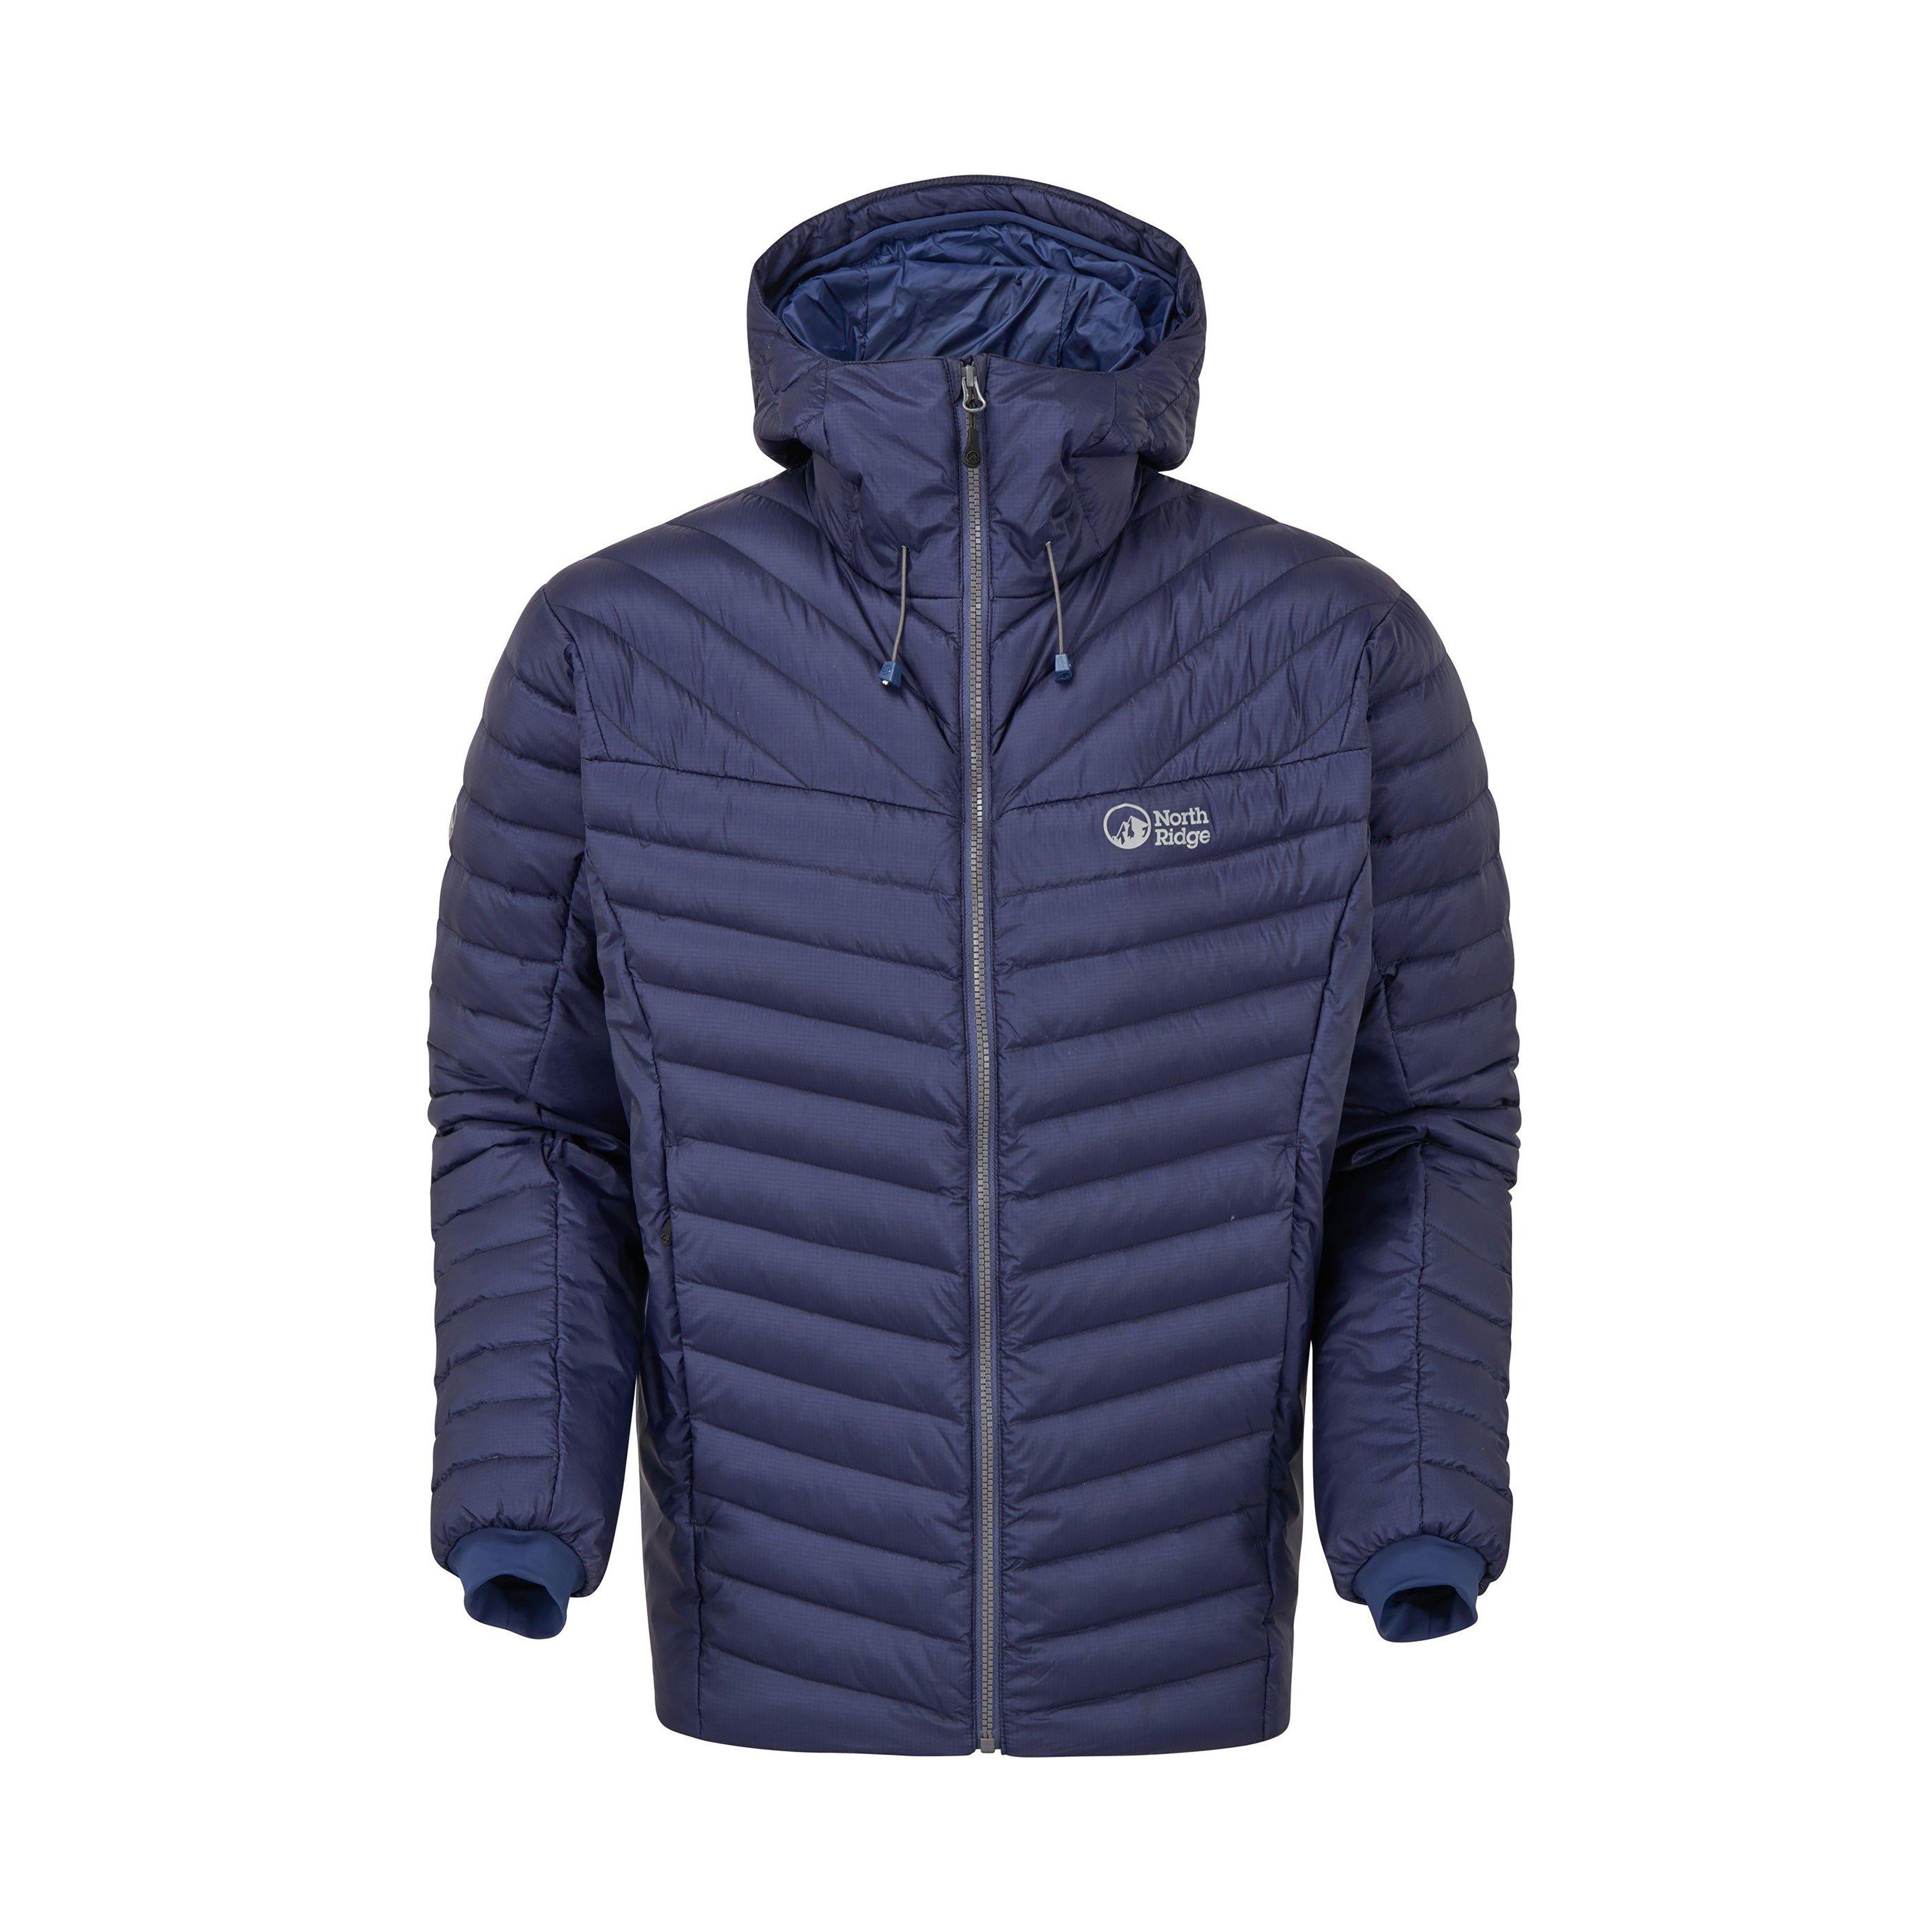 North Ridge Men's Hybrid Spirit Down Jacket, BLUE/JACKET